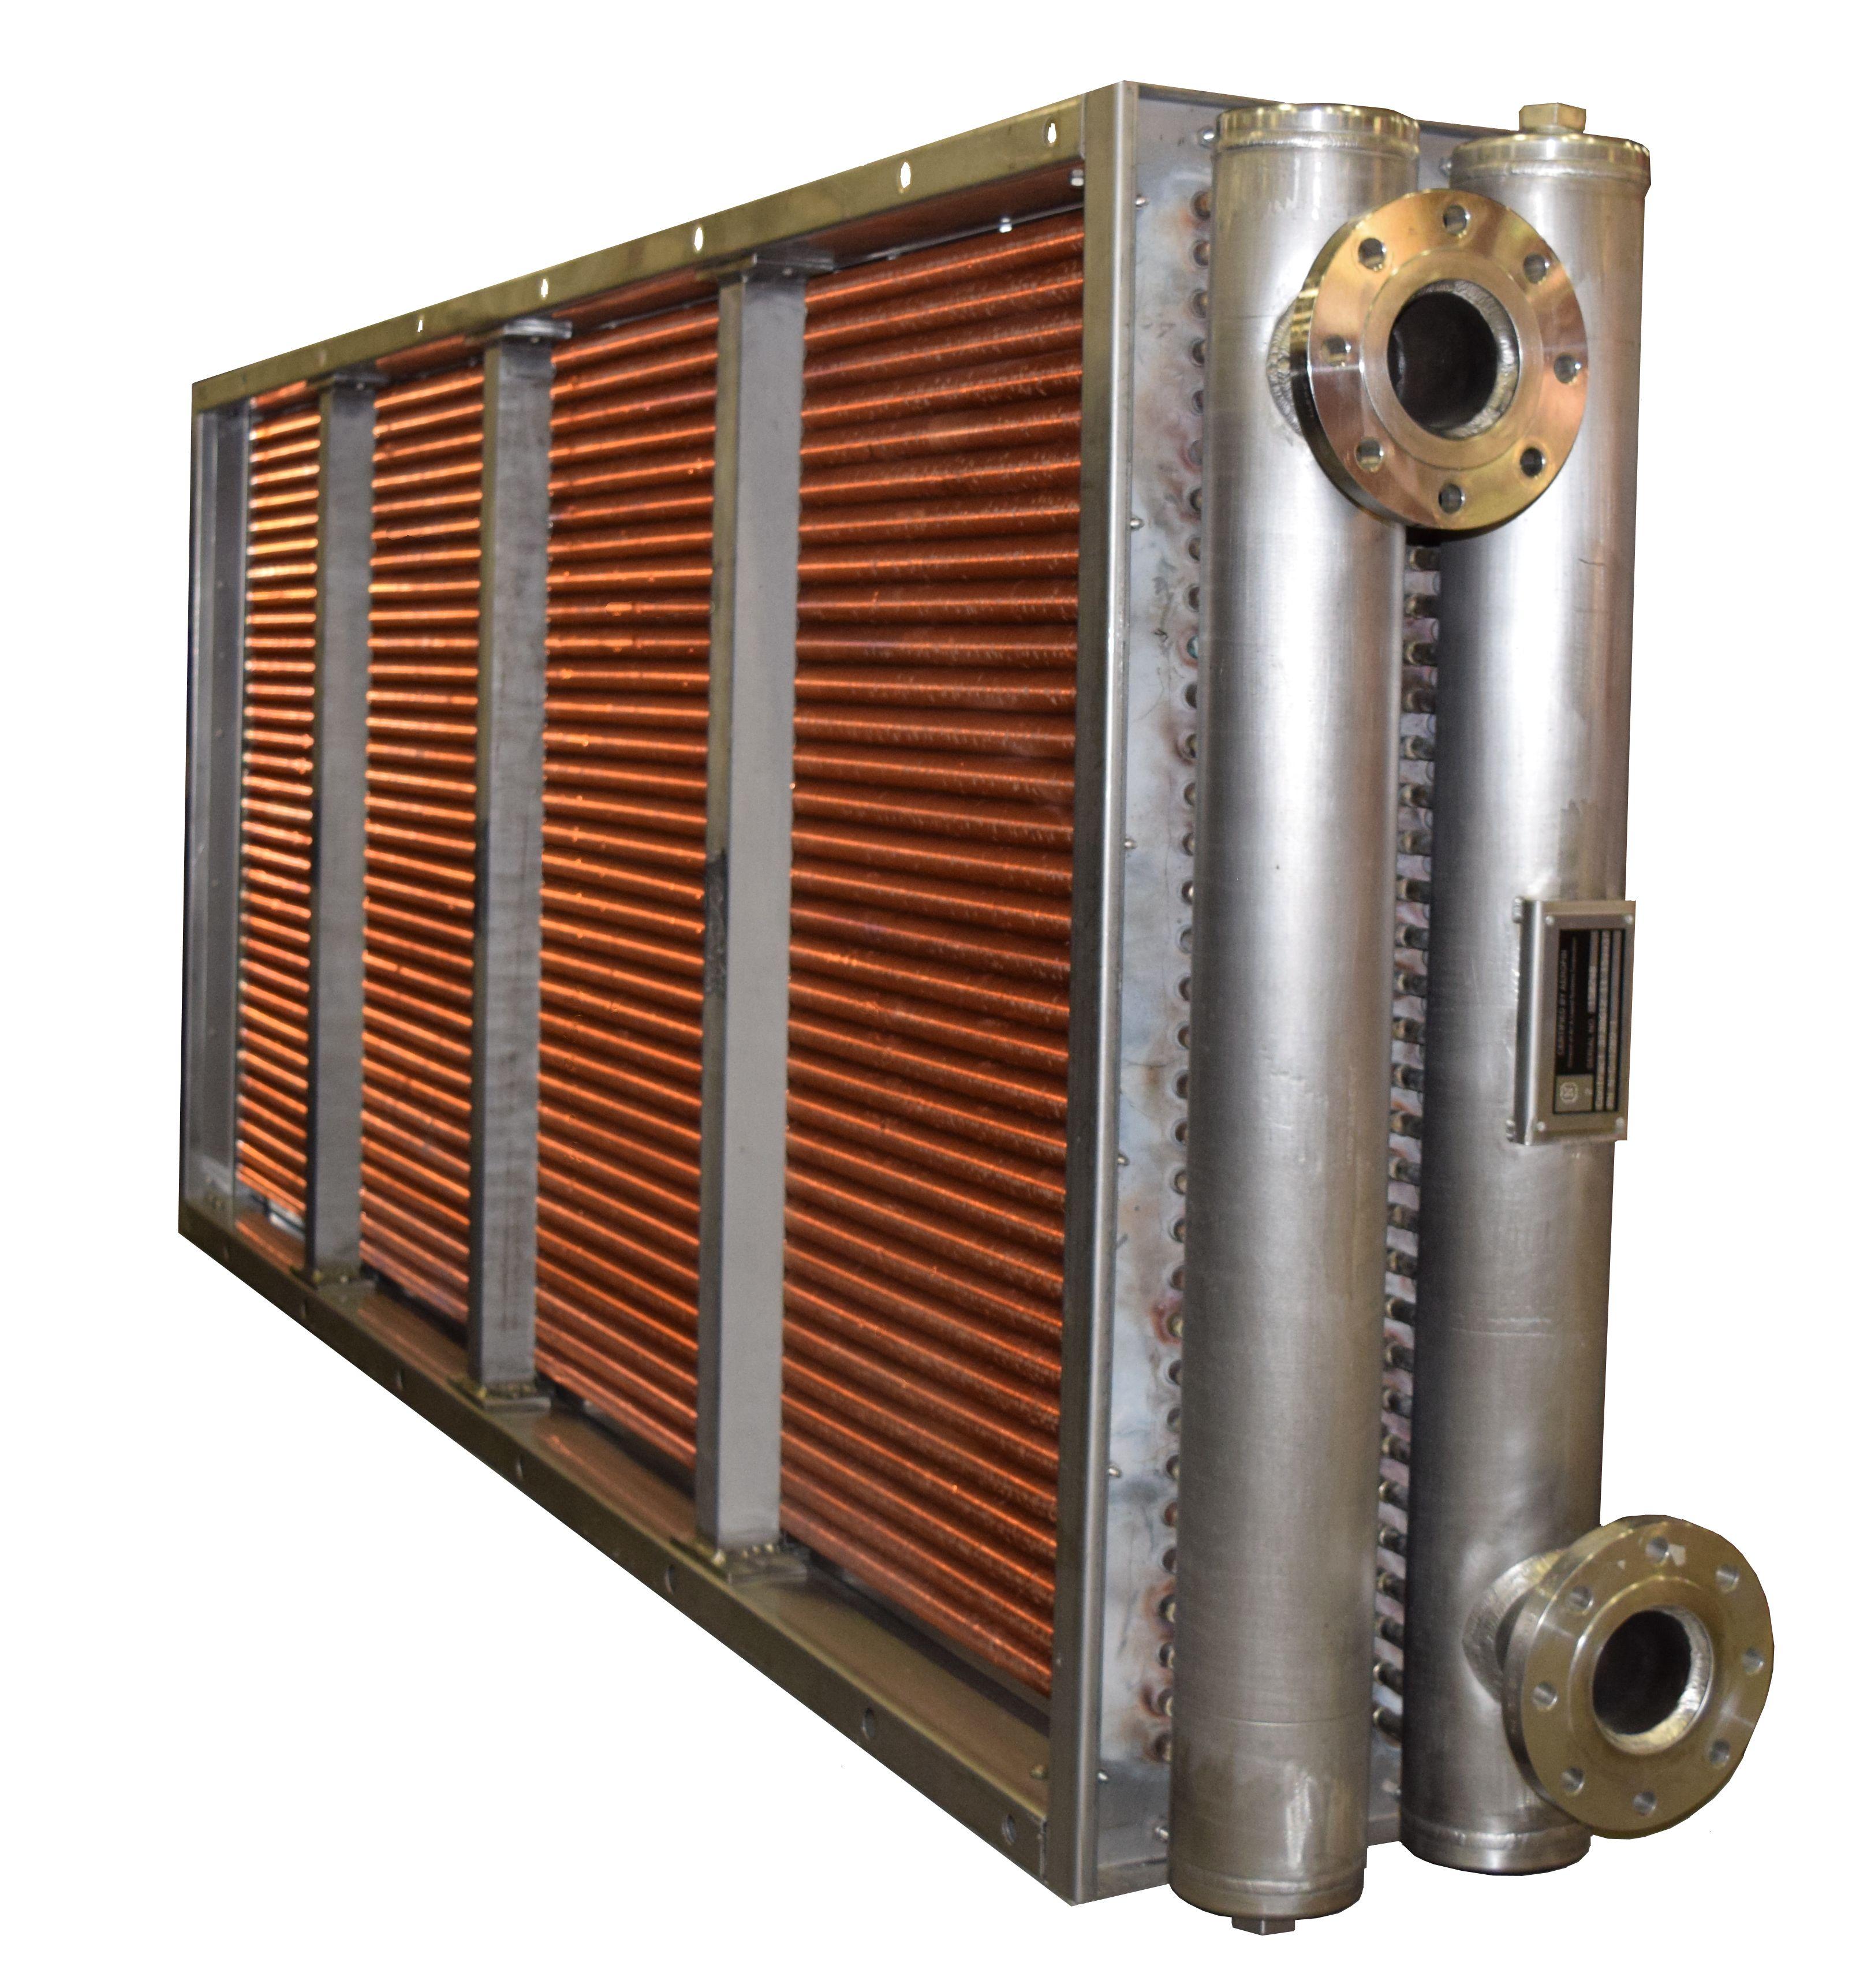 Spiral Fin Construction Aerofin Heat Transfer Products